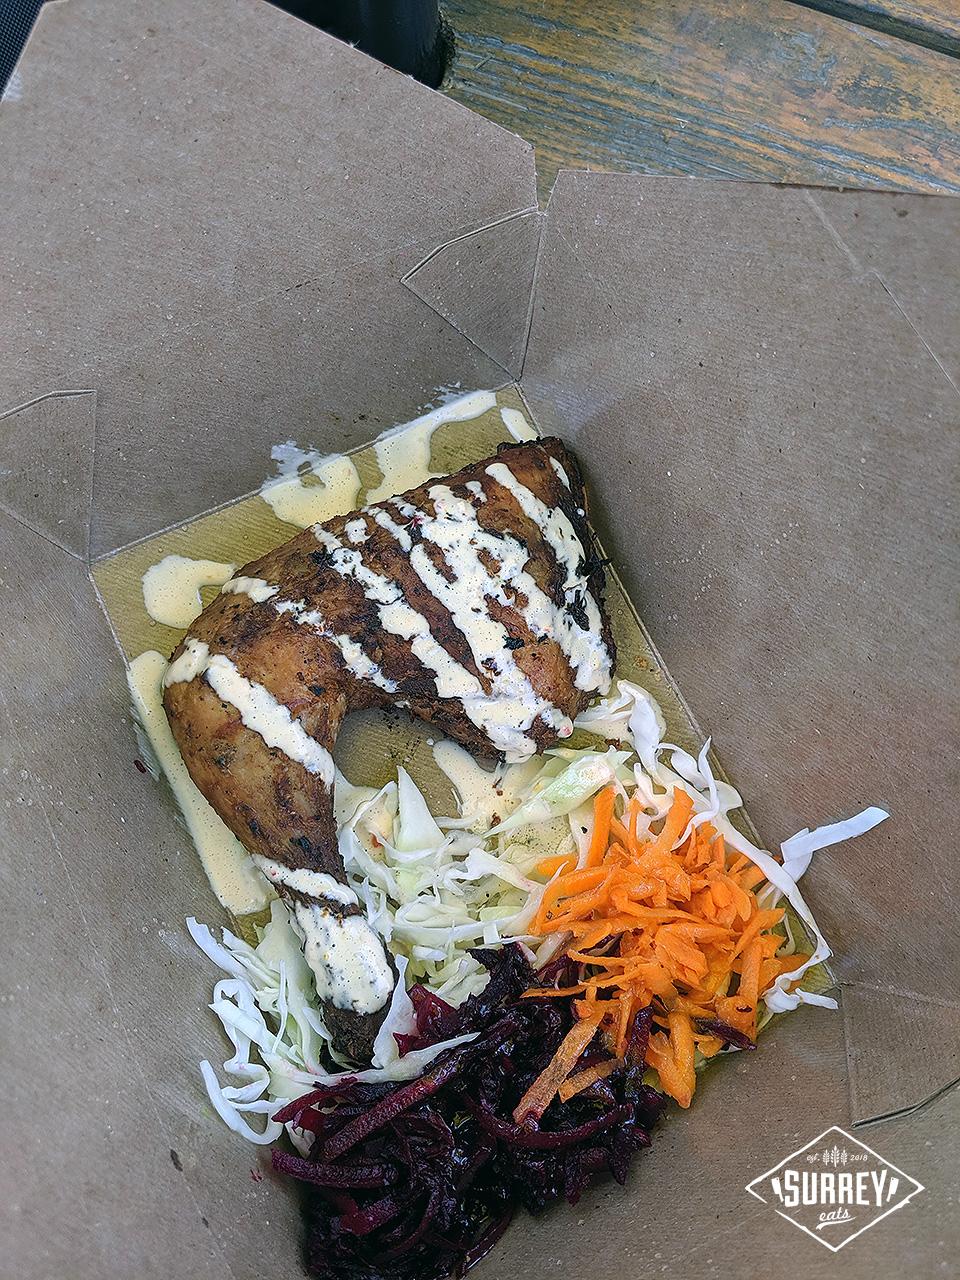 Caribbean Jerk Chicken with Coleslaw from The Jerk Shack